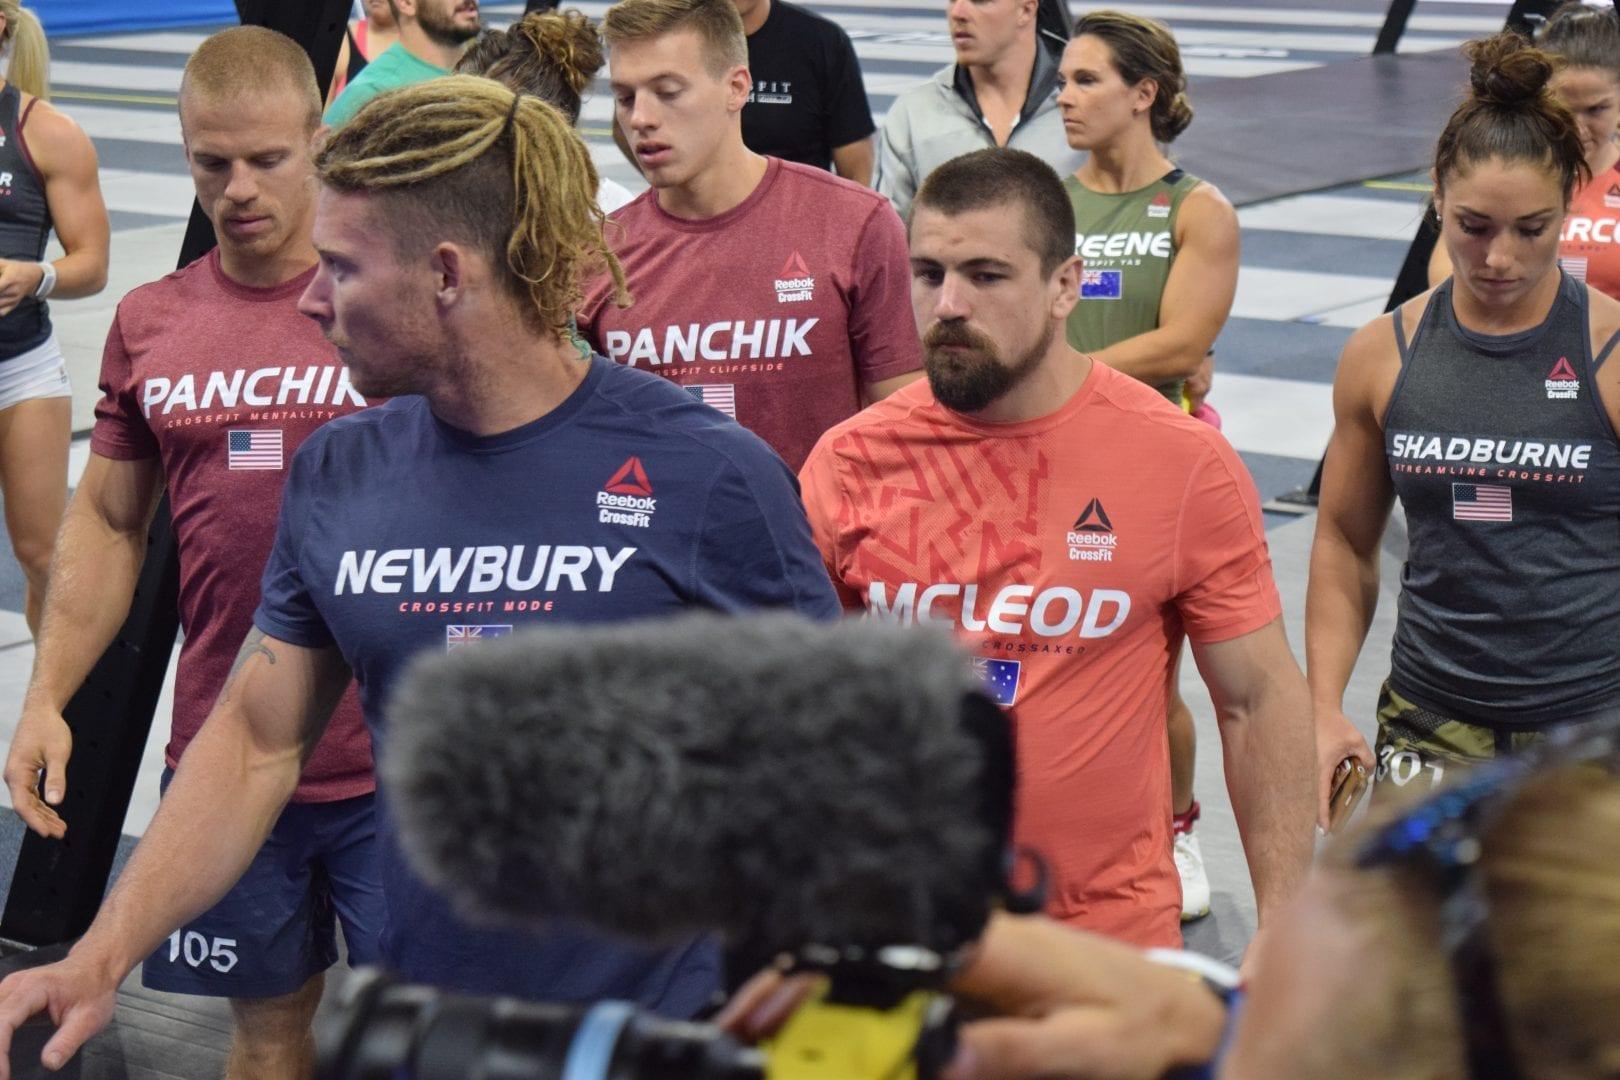 Matt Mcleod of Australia on the floor of the Coliseum at the 2019 CrossFit Games